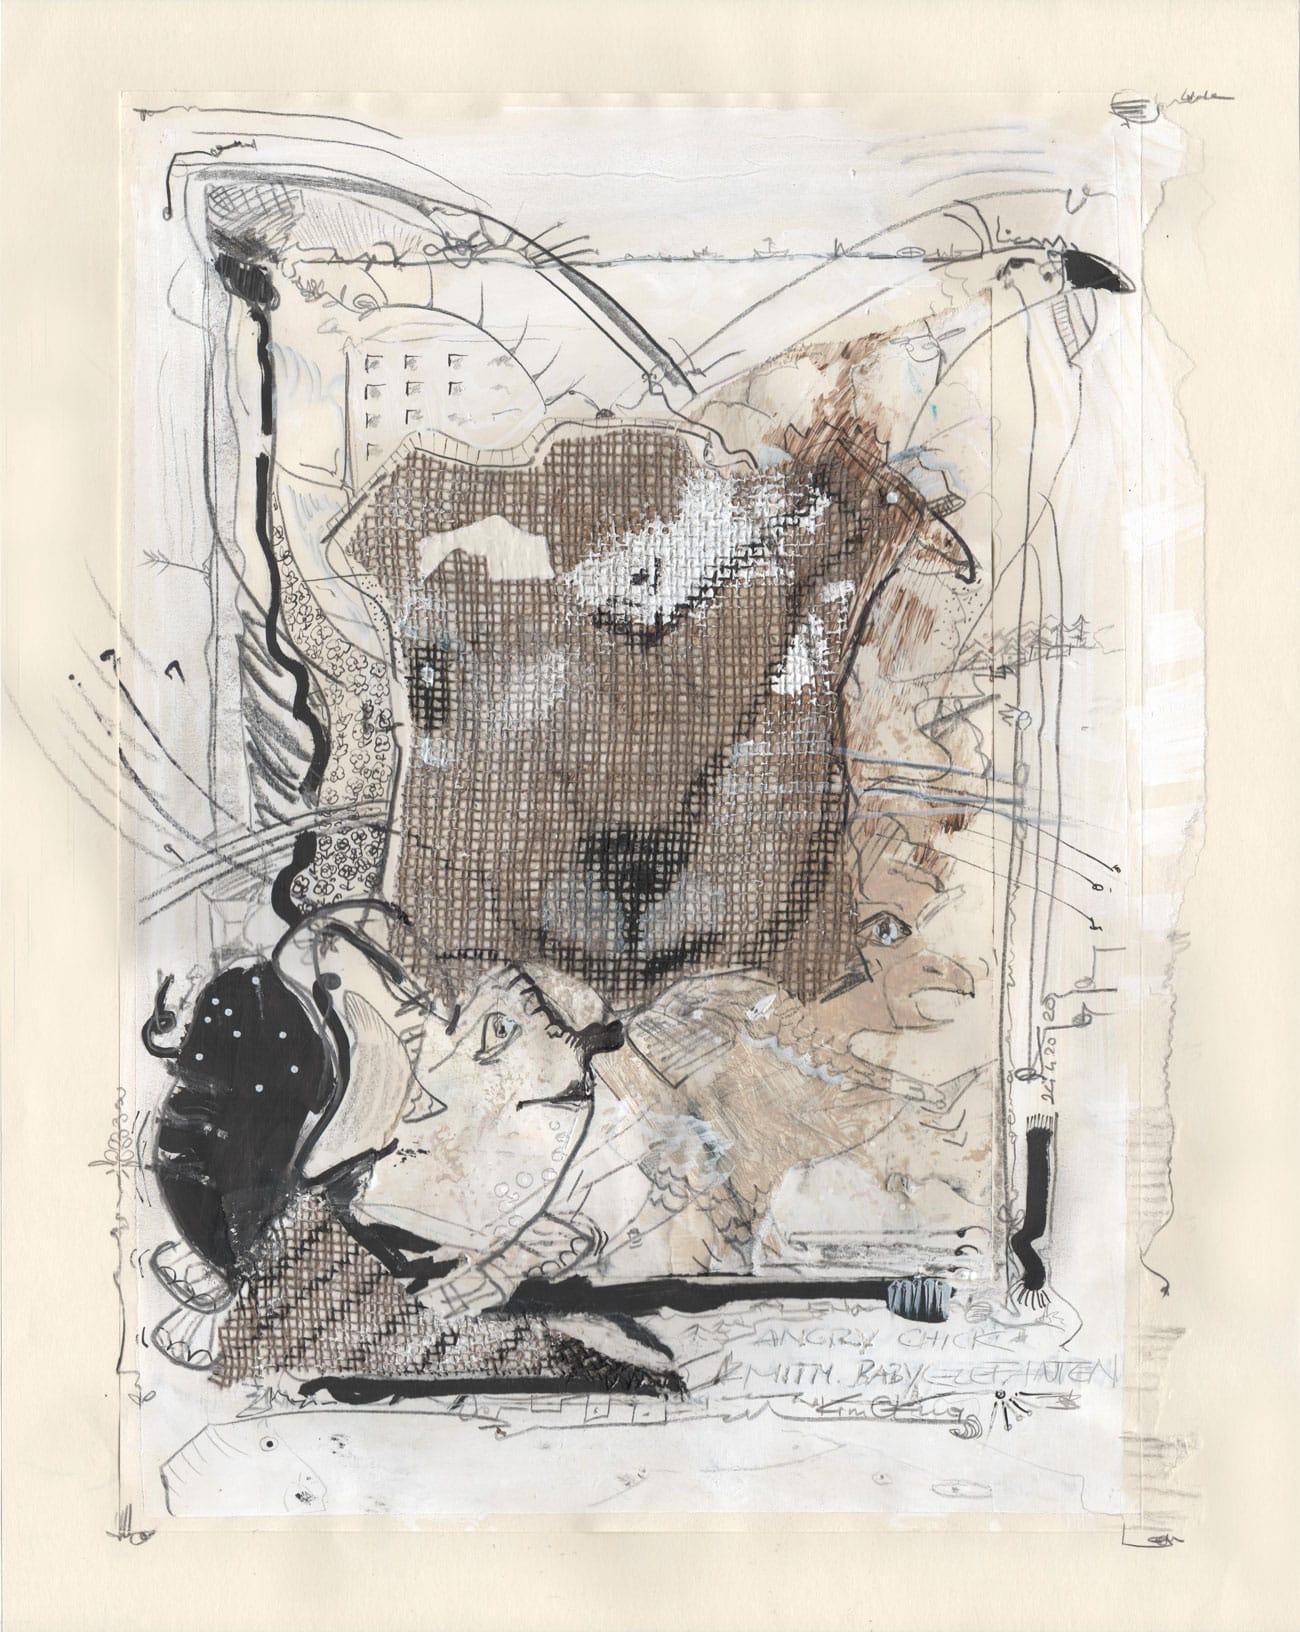 Kim Okura - Angry Chick Mitm Baby Elefanten -Jutte Okuraee auf Japanpapier